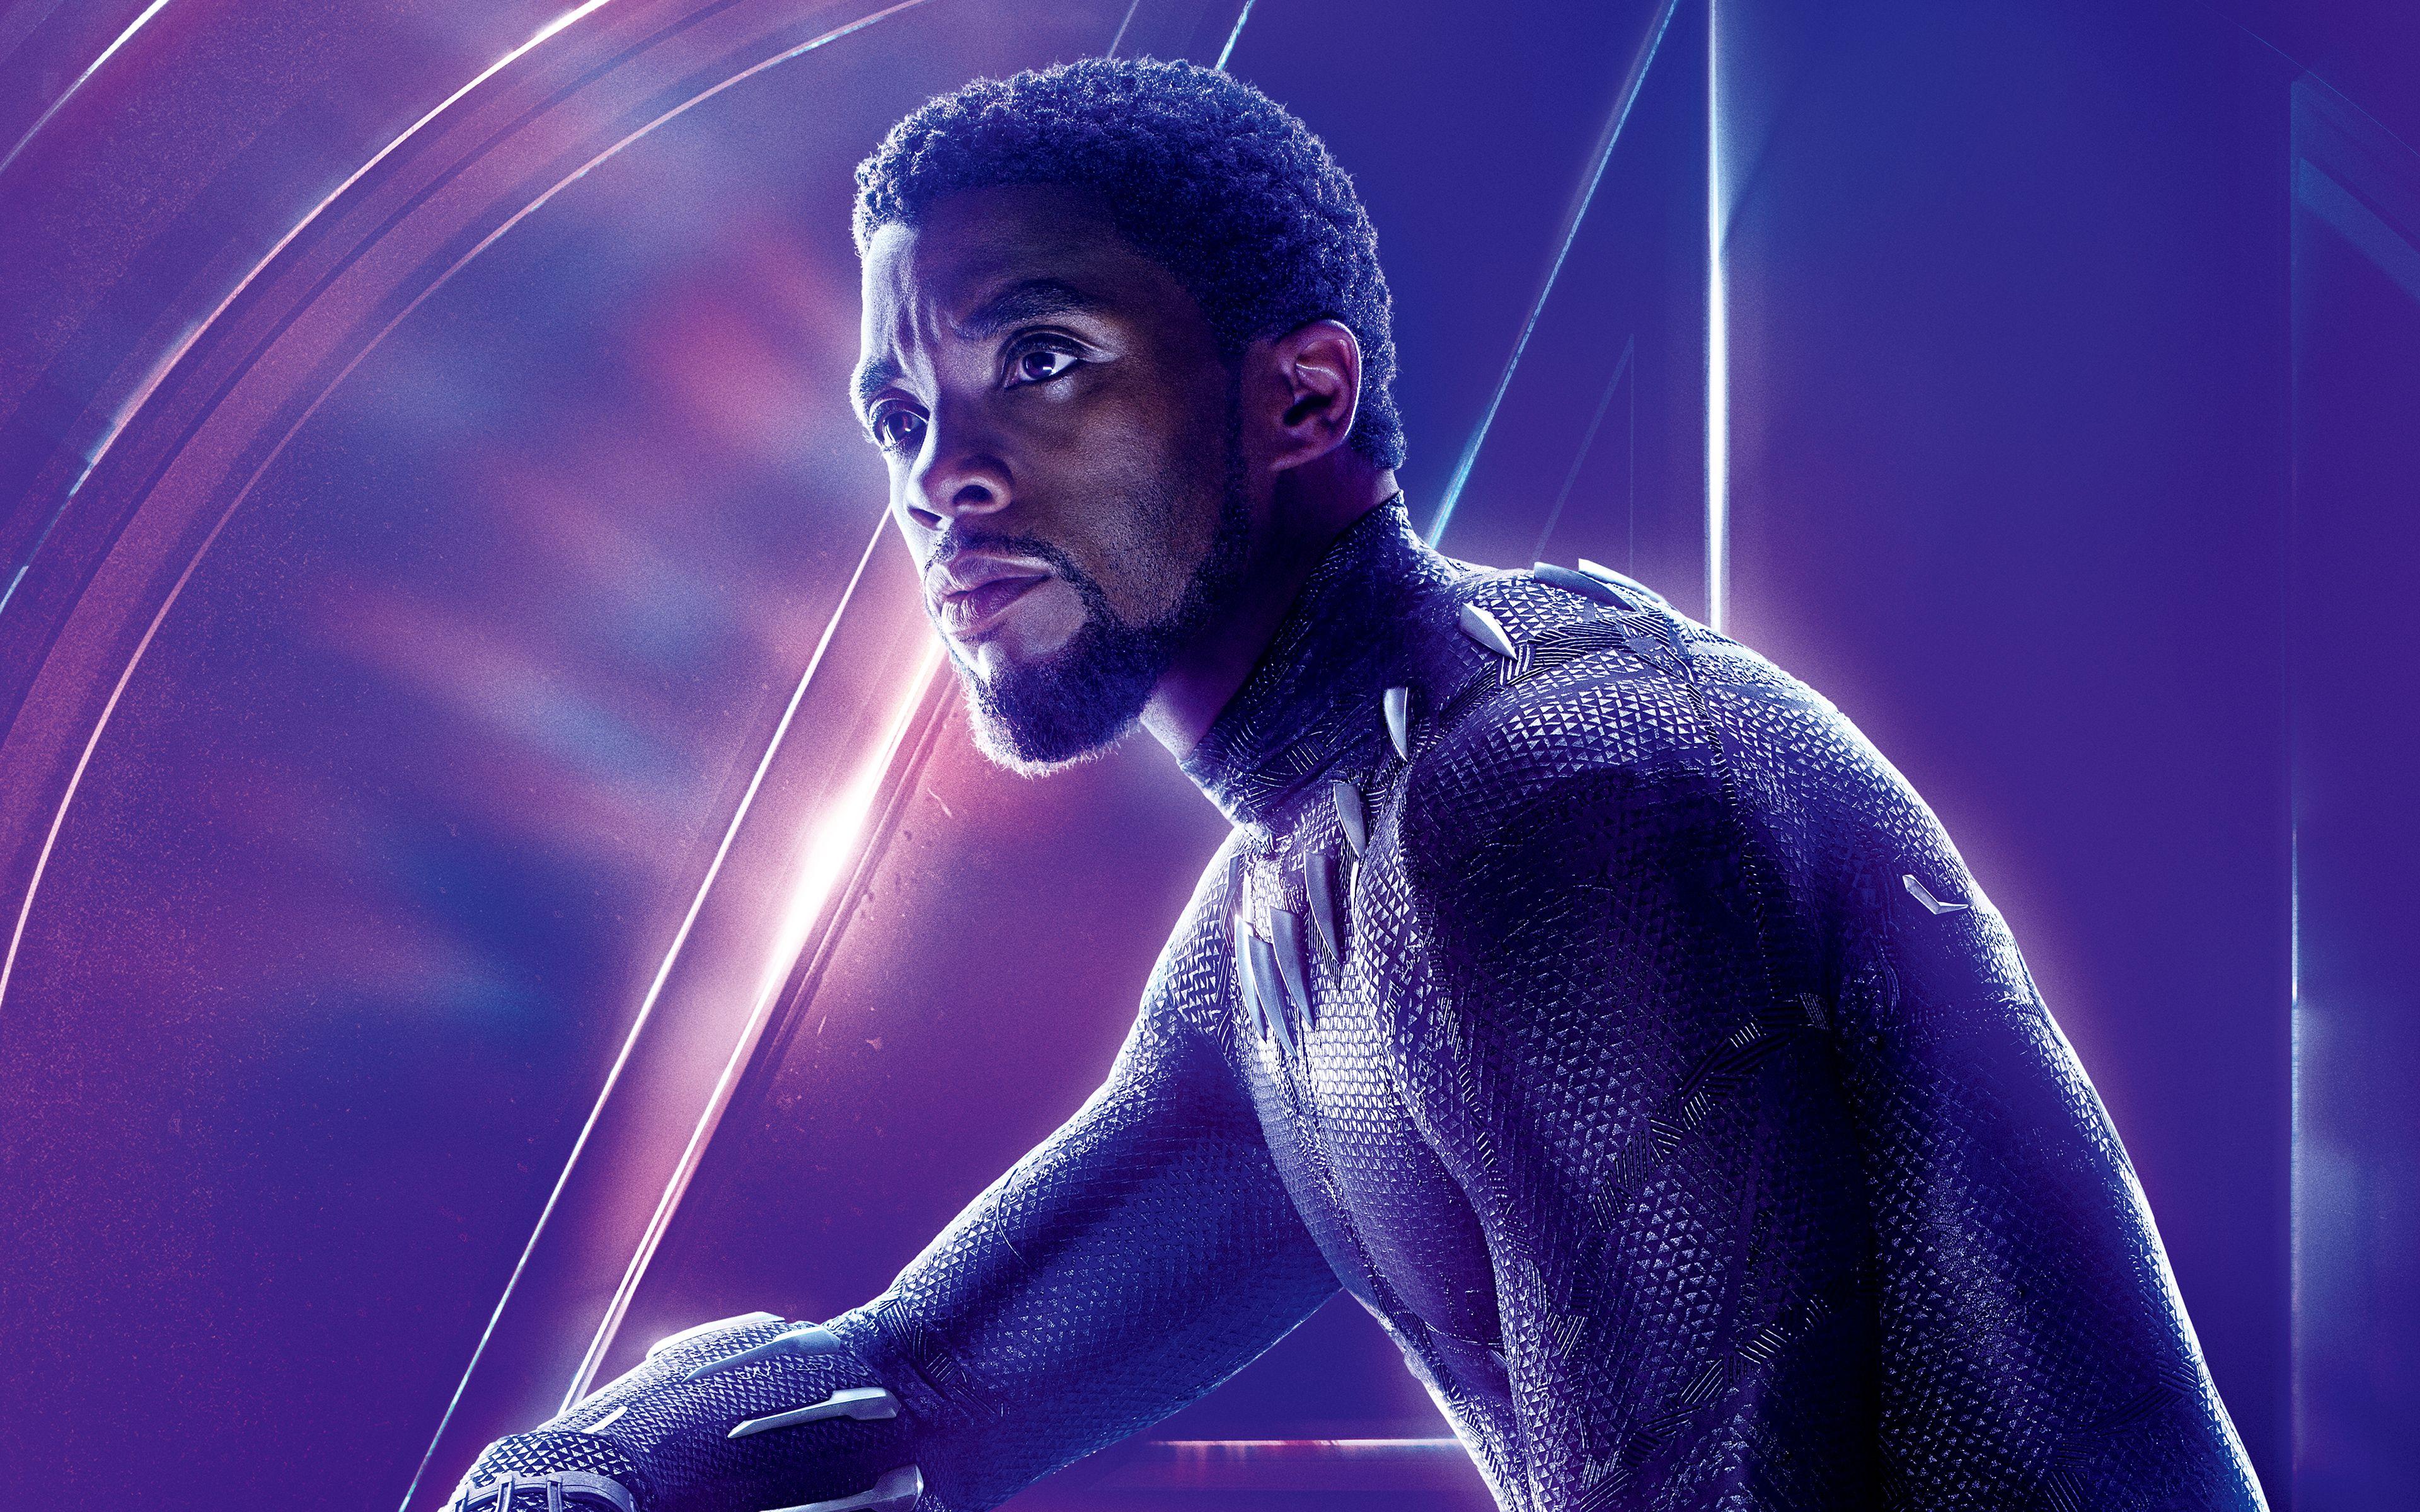 Avengers Infinity War Chadwick Boseman Black Panther 4k 8k Http Www Pixel4k Com Avengers Infinity War Chadwick Bo Avengers Infinity War Infinity War Avengers